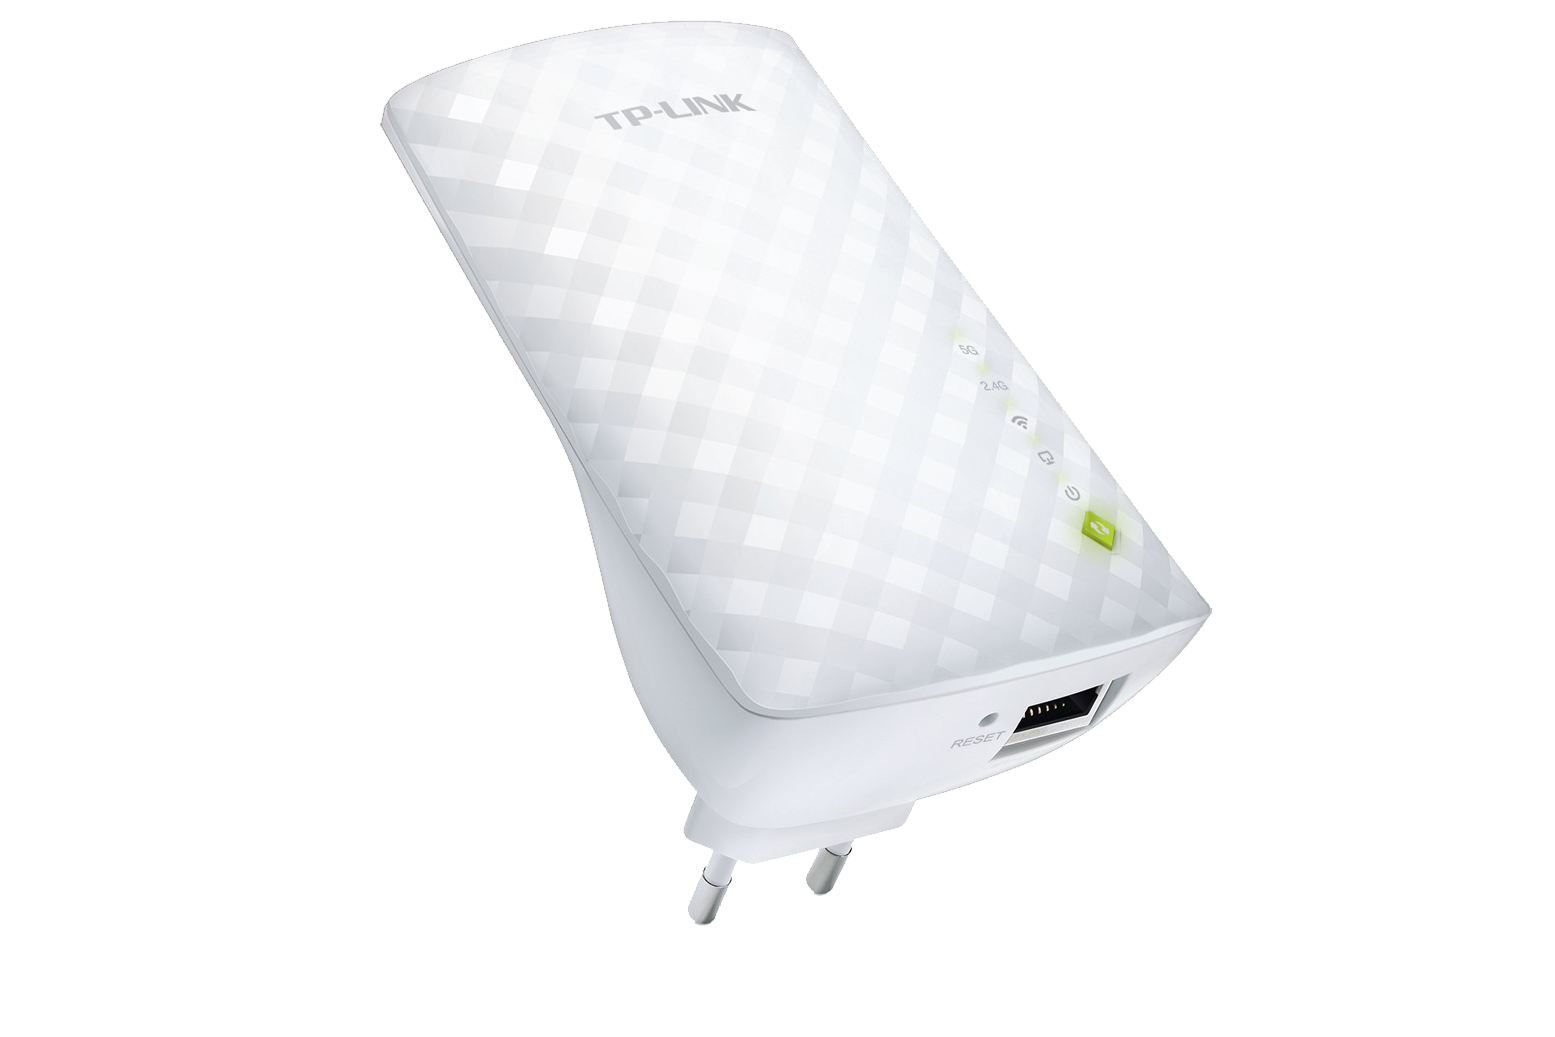 tp link re200 ac750 wlan repeater hifi. Black Bedroom Furniture Sets. Home Design Ideas